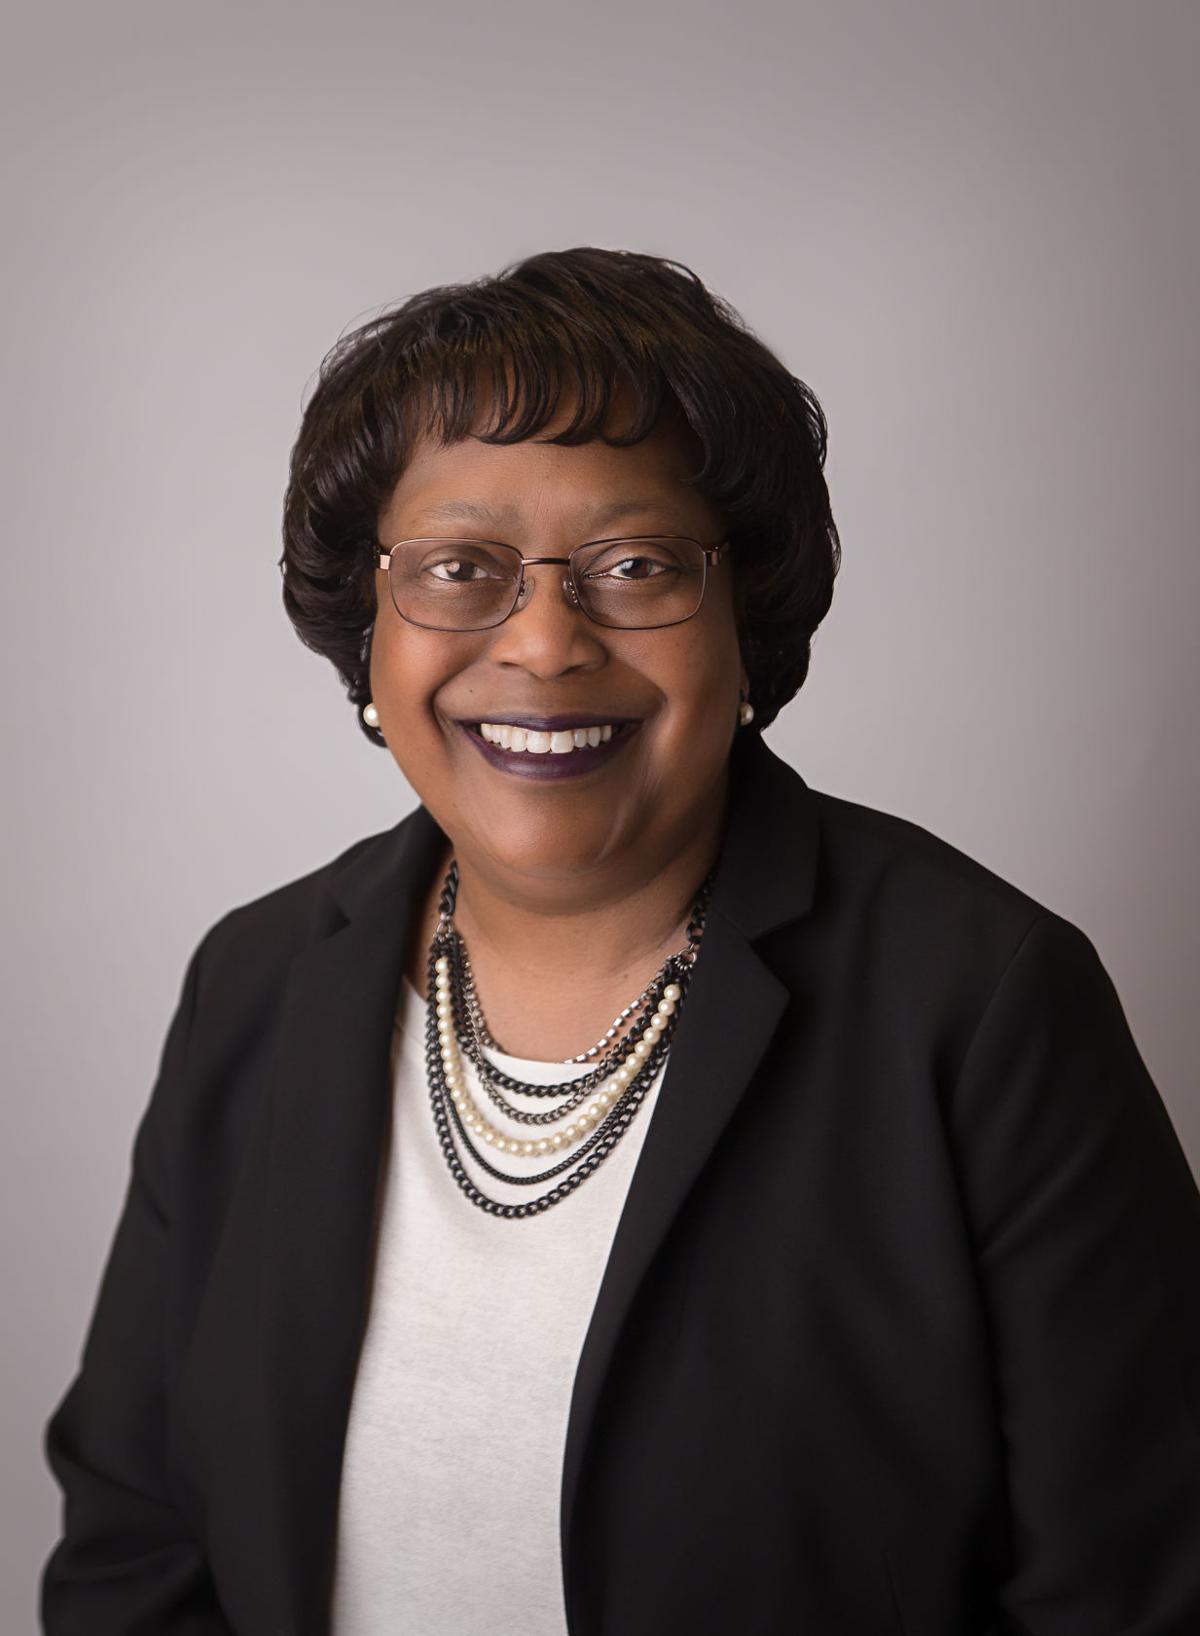 FWCS Superintendent Wendy Robinson